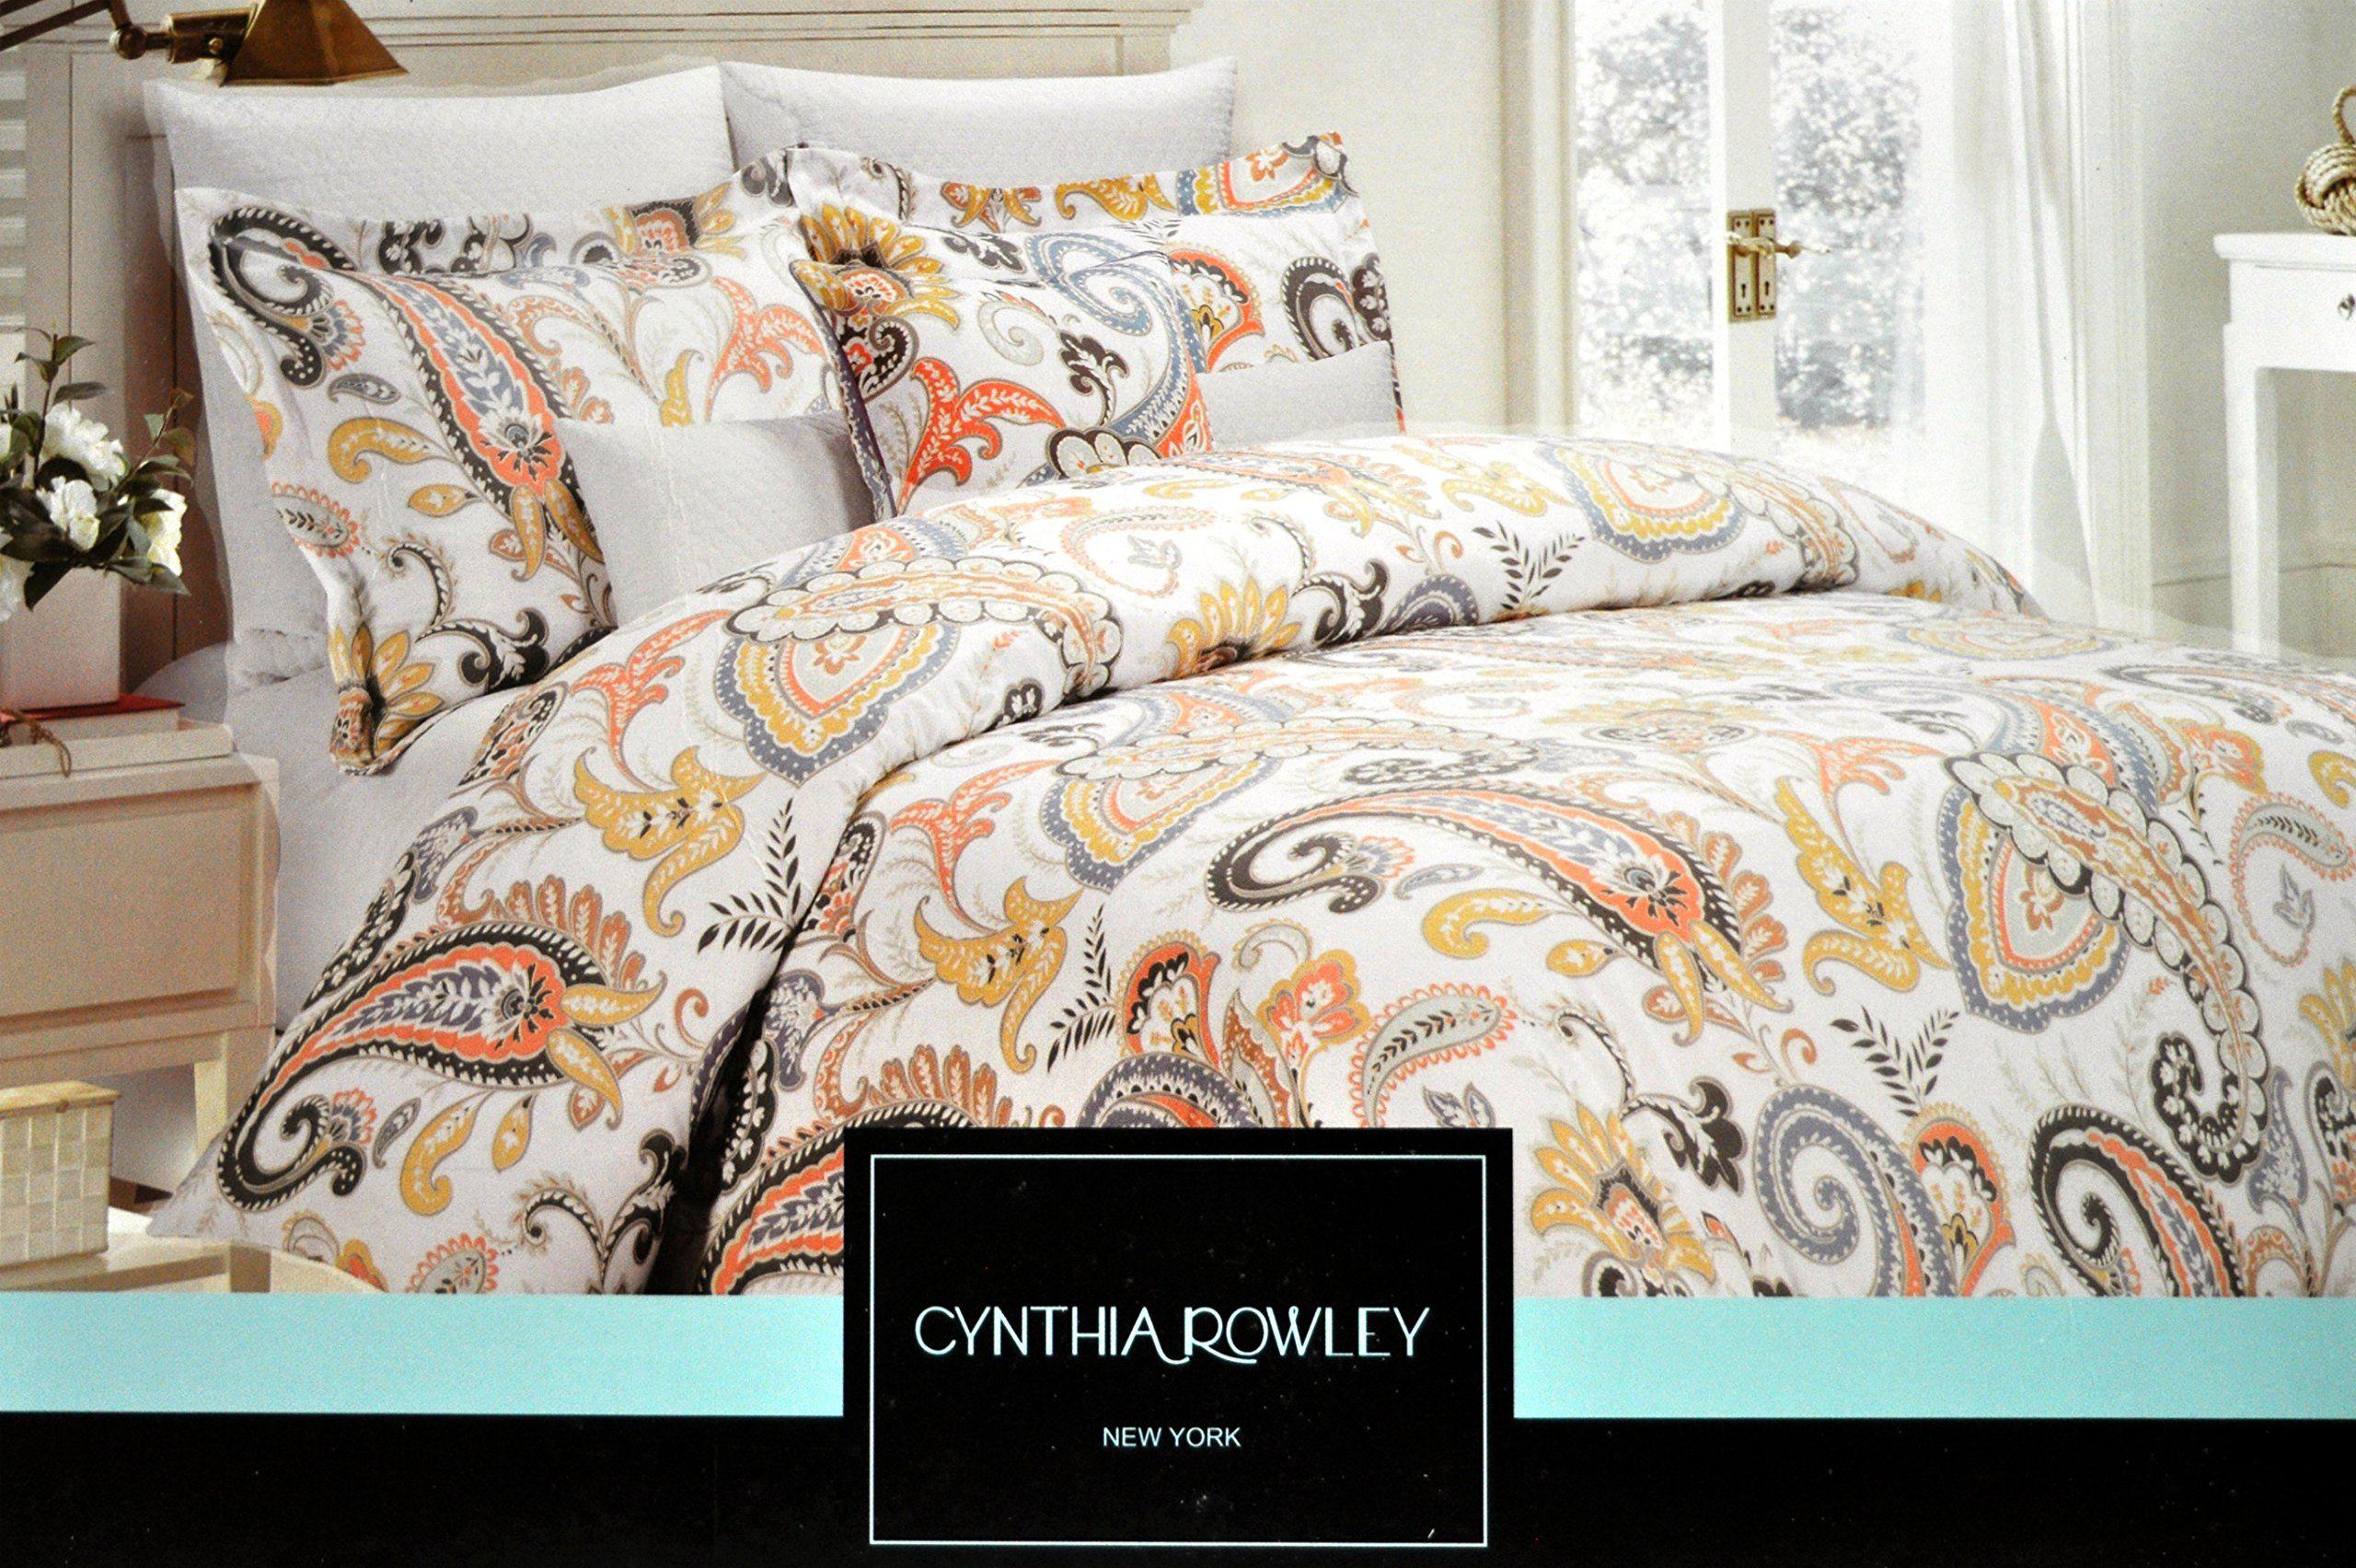 Cynthia Rowley King Duvet Cover 3pc Set Multicolored Paisley